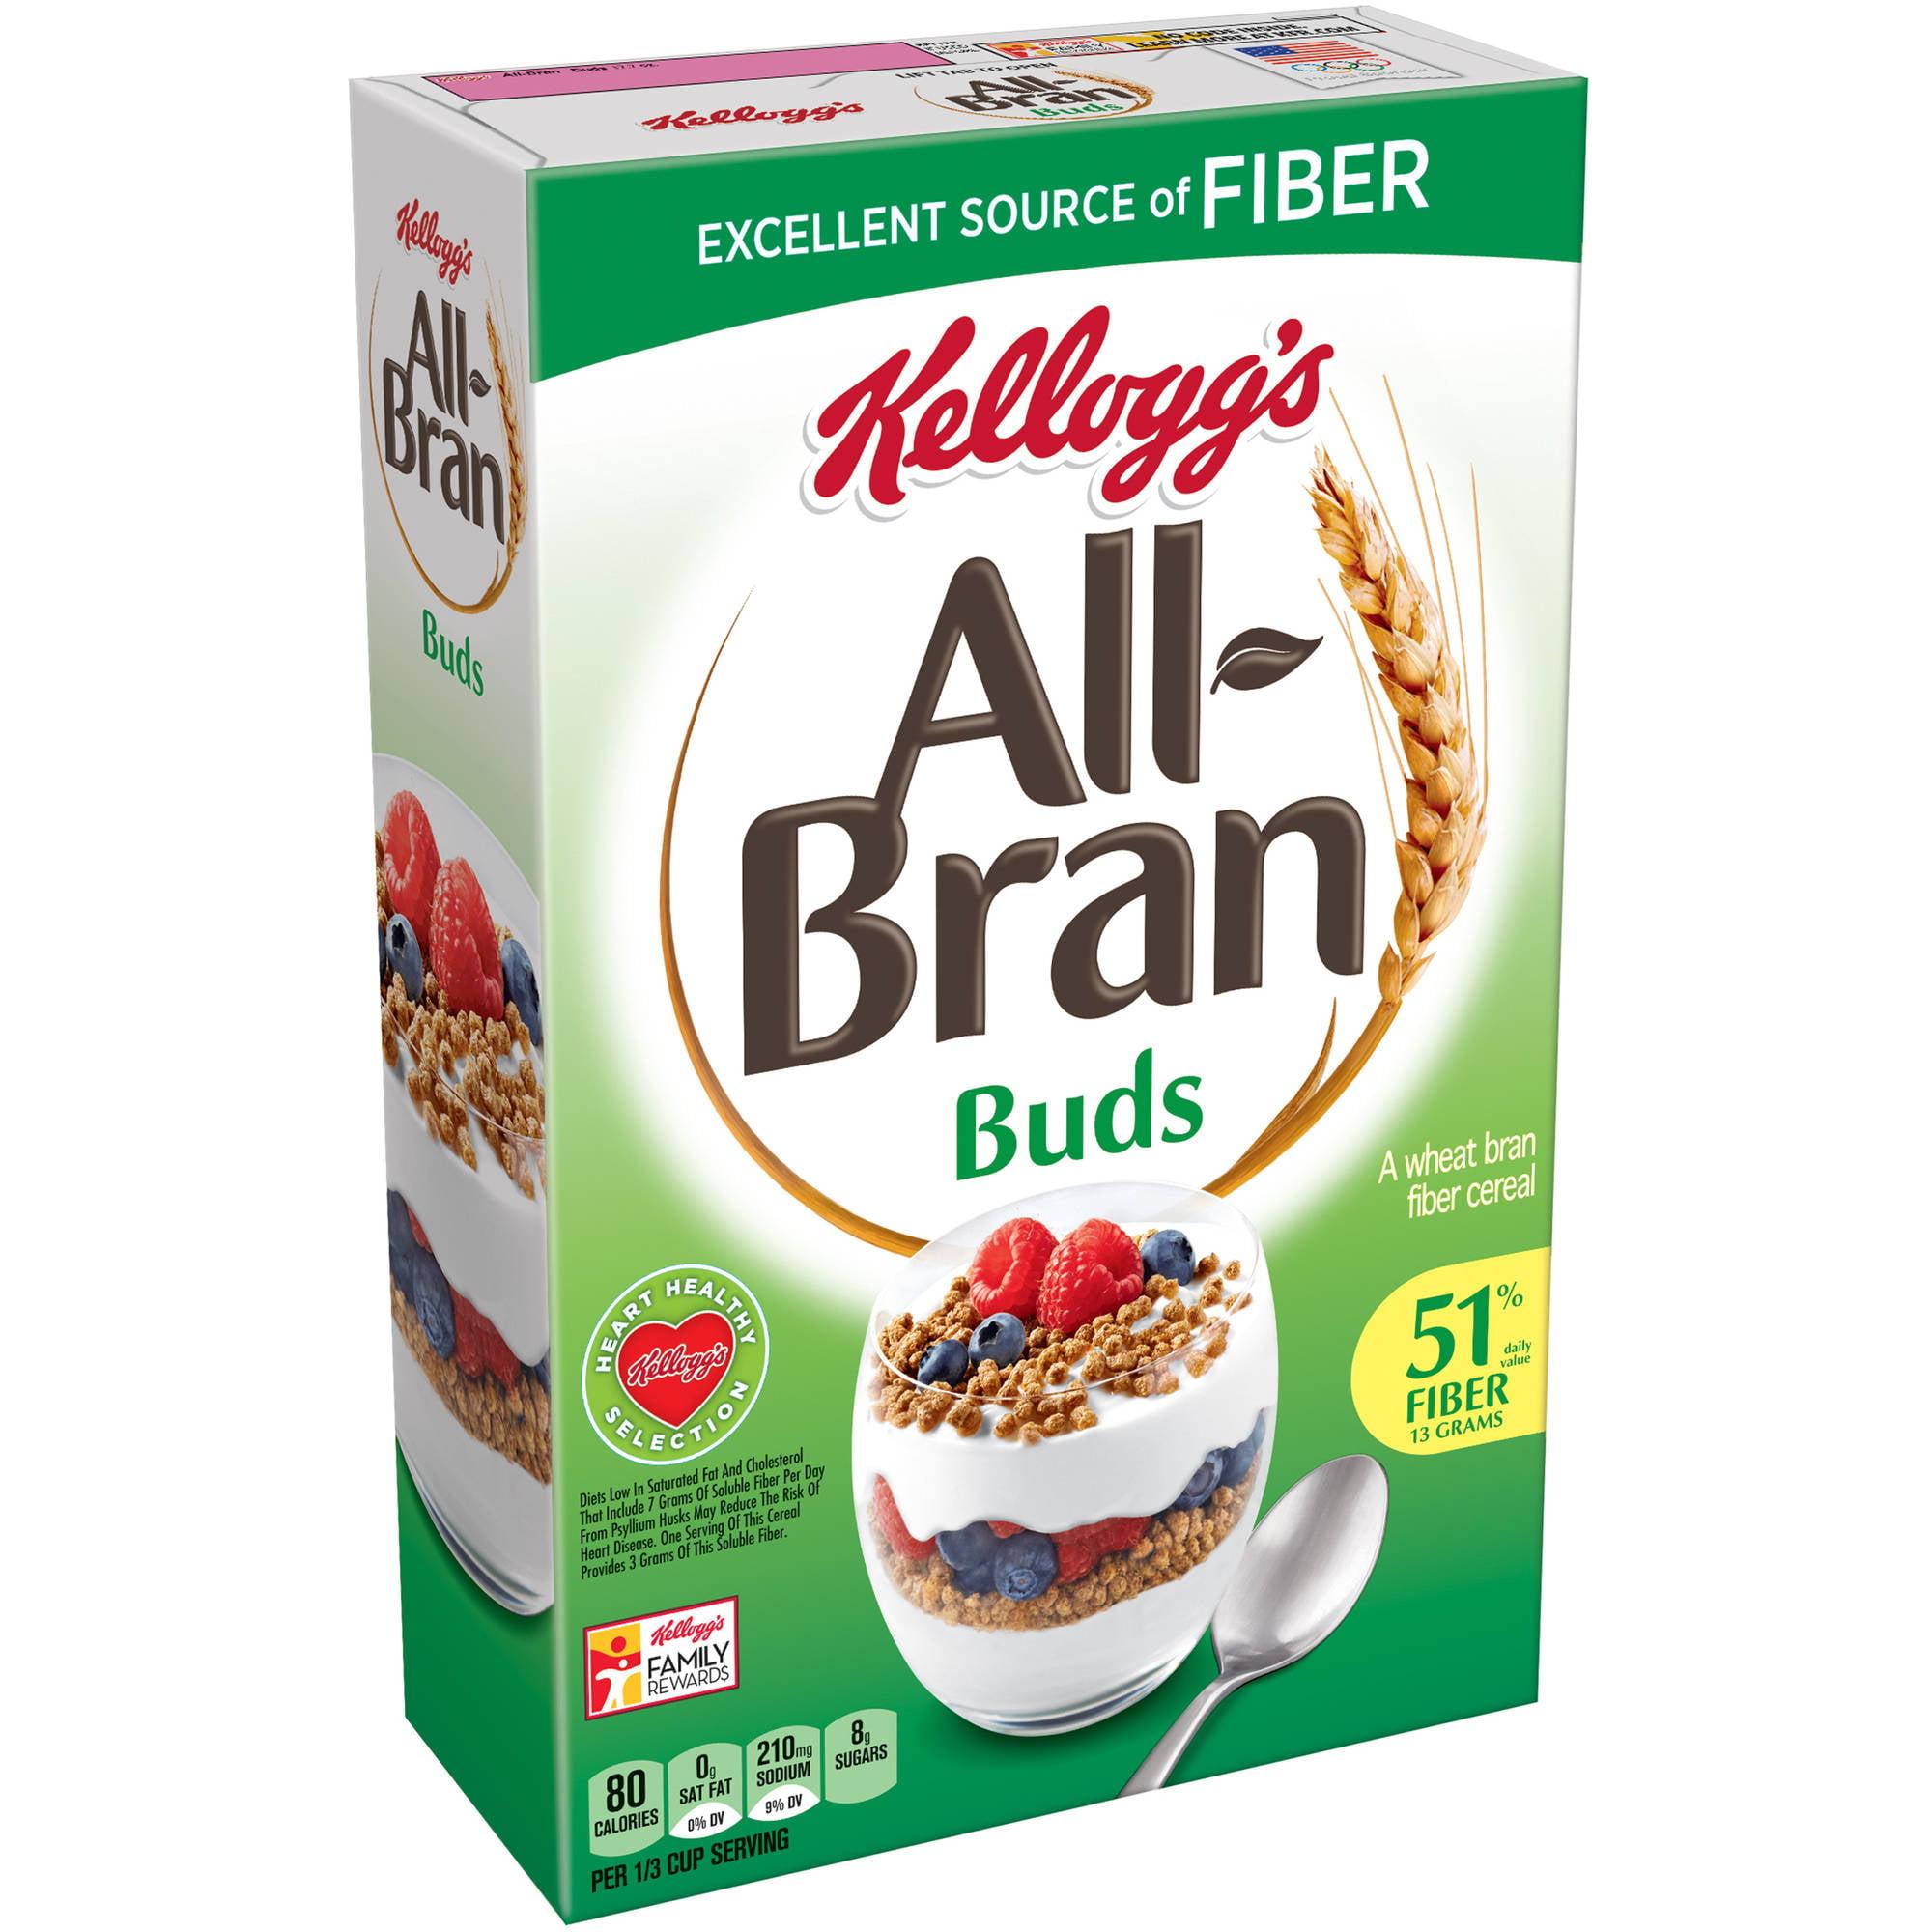 Kellogg's All-Bran Branbuds Cereal, 17.7 Oz